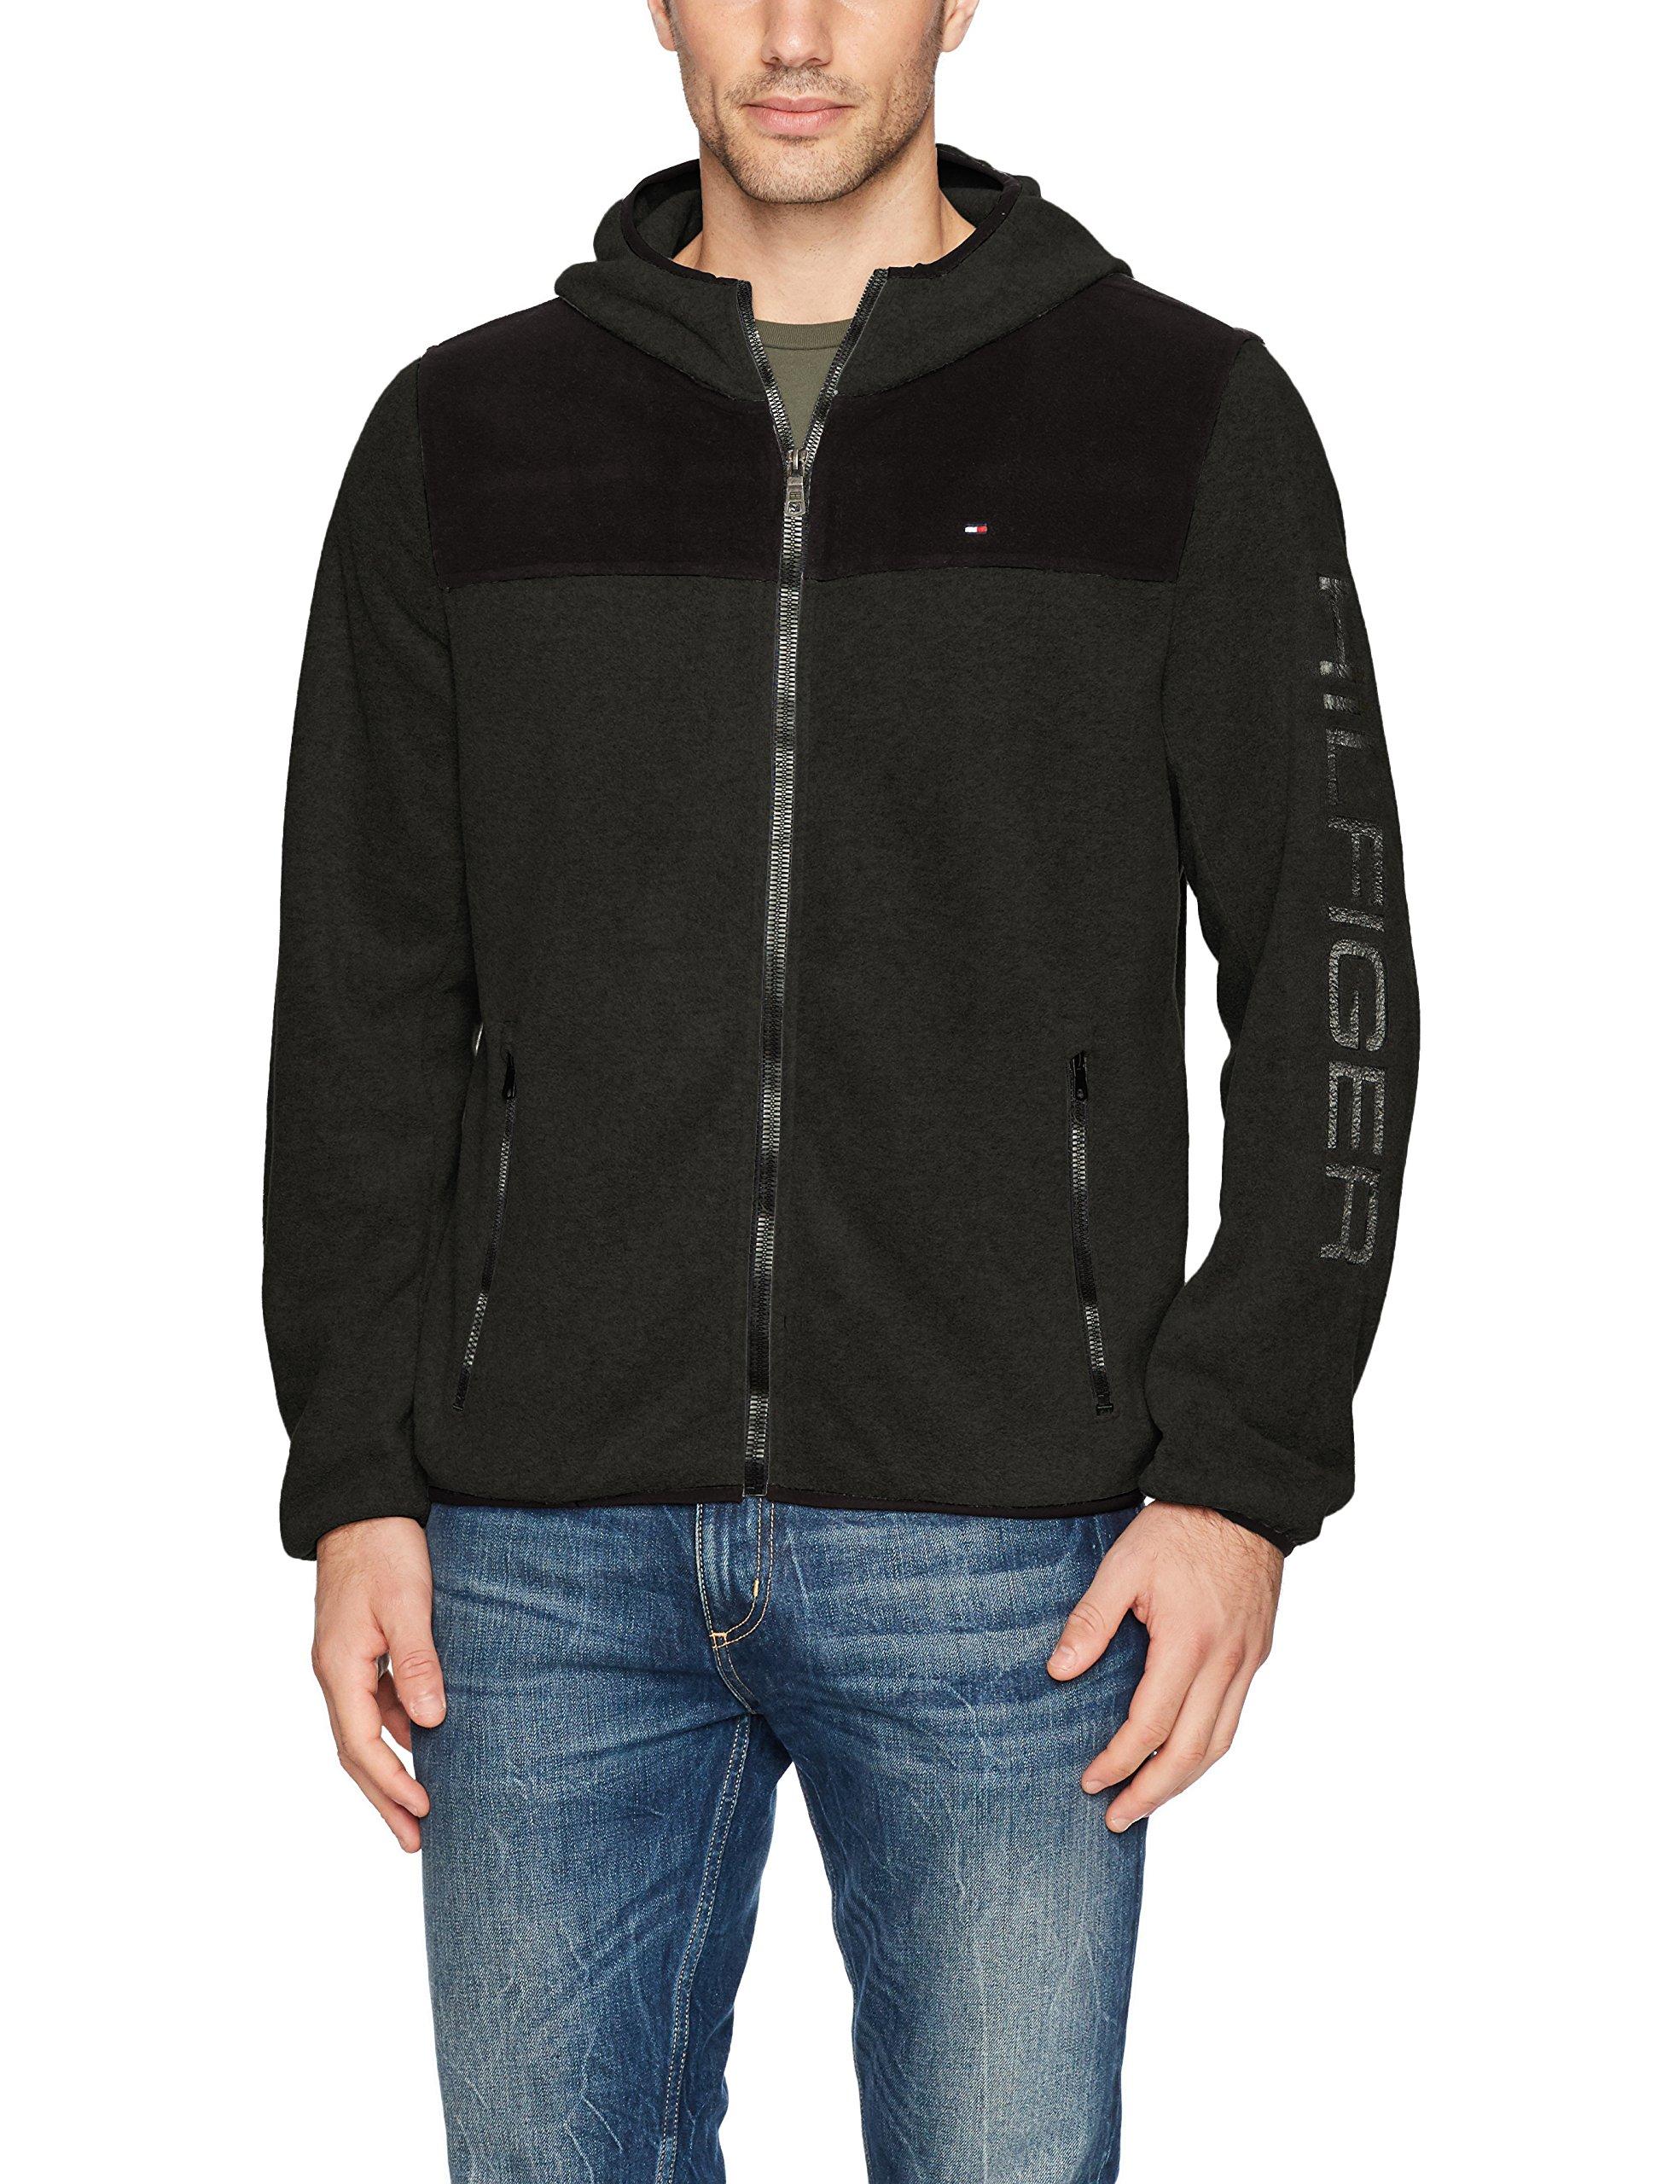 Tommy Hilfiger Men's Hooded Performance Fleece Jacket, Black/Charcoal, Small